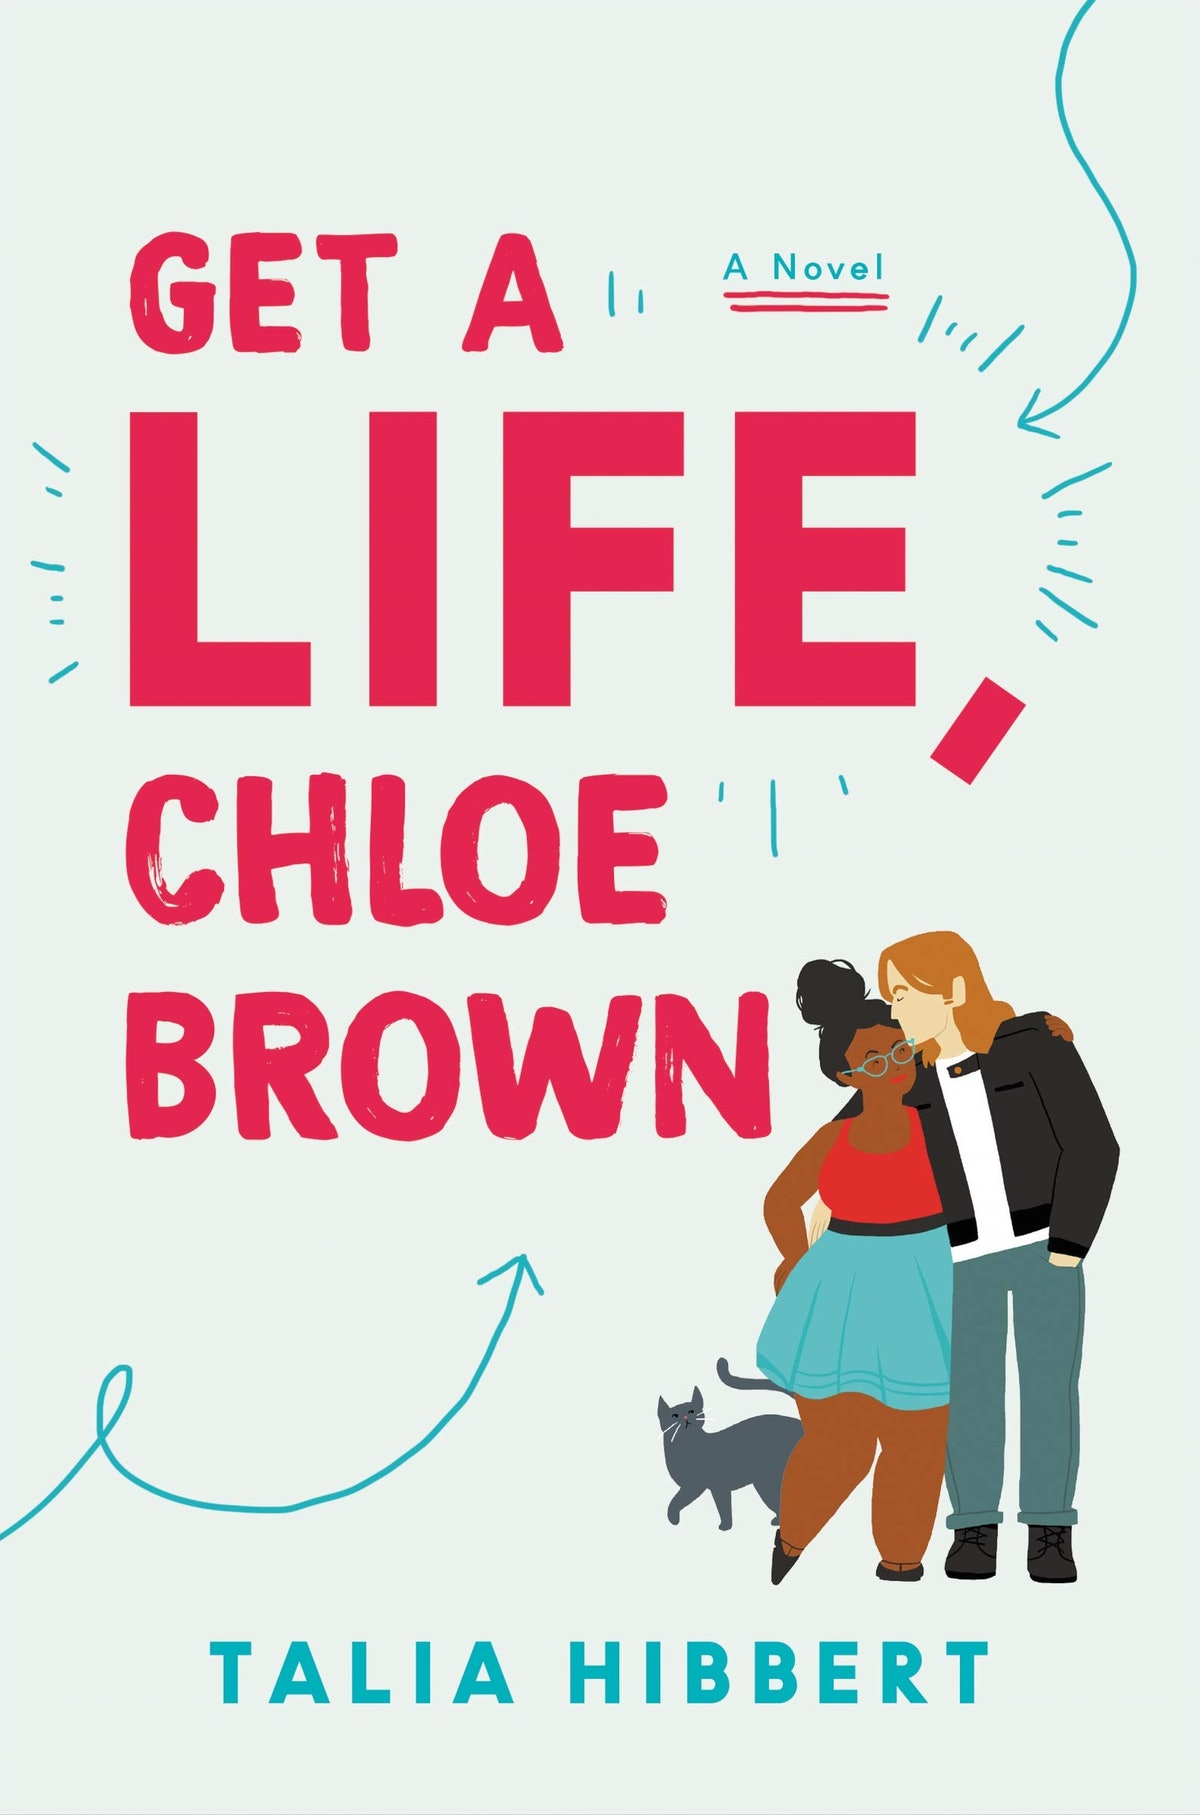 'Get a Life, Chloe Brown' by Talia Hibbert